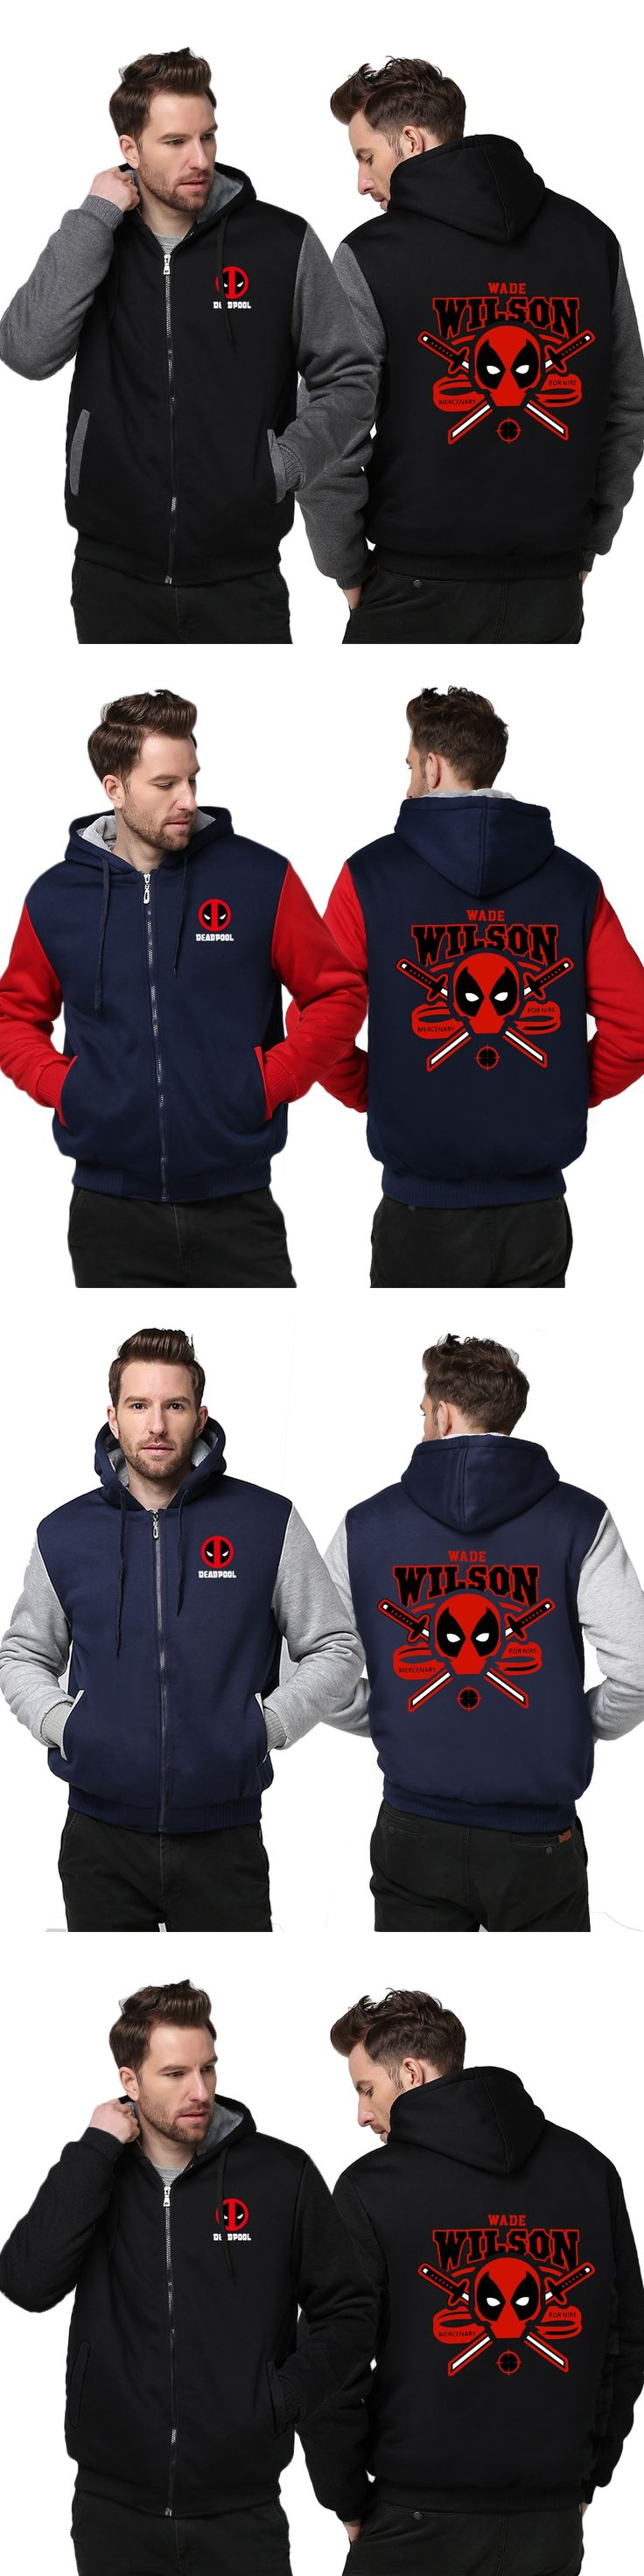 New Deadpool Super Warm Thicken Fleece Zip Up Hoodie Men's Coat Hoodies Sweaterwear cotton NEW Red USA Size Outwear